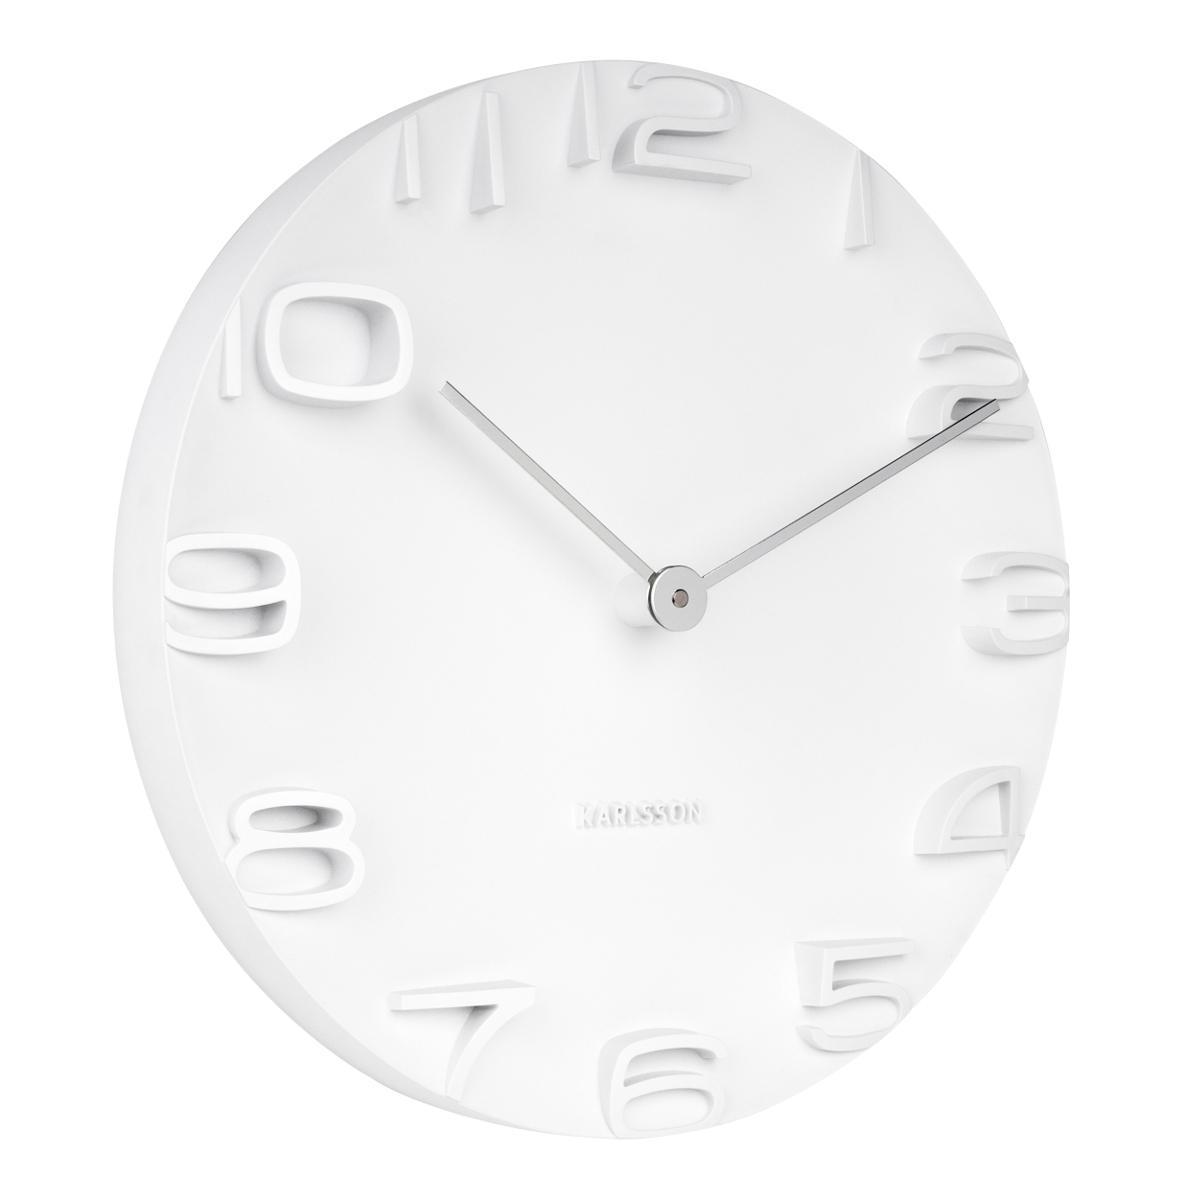 Buy Top Karlsson Clocks Home Decor Lazada Wooden Clock Bamboo 1293 Red Lightblue Lightgreen Light Wall On The Edge White W Chrome Hands